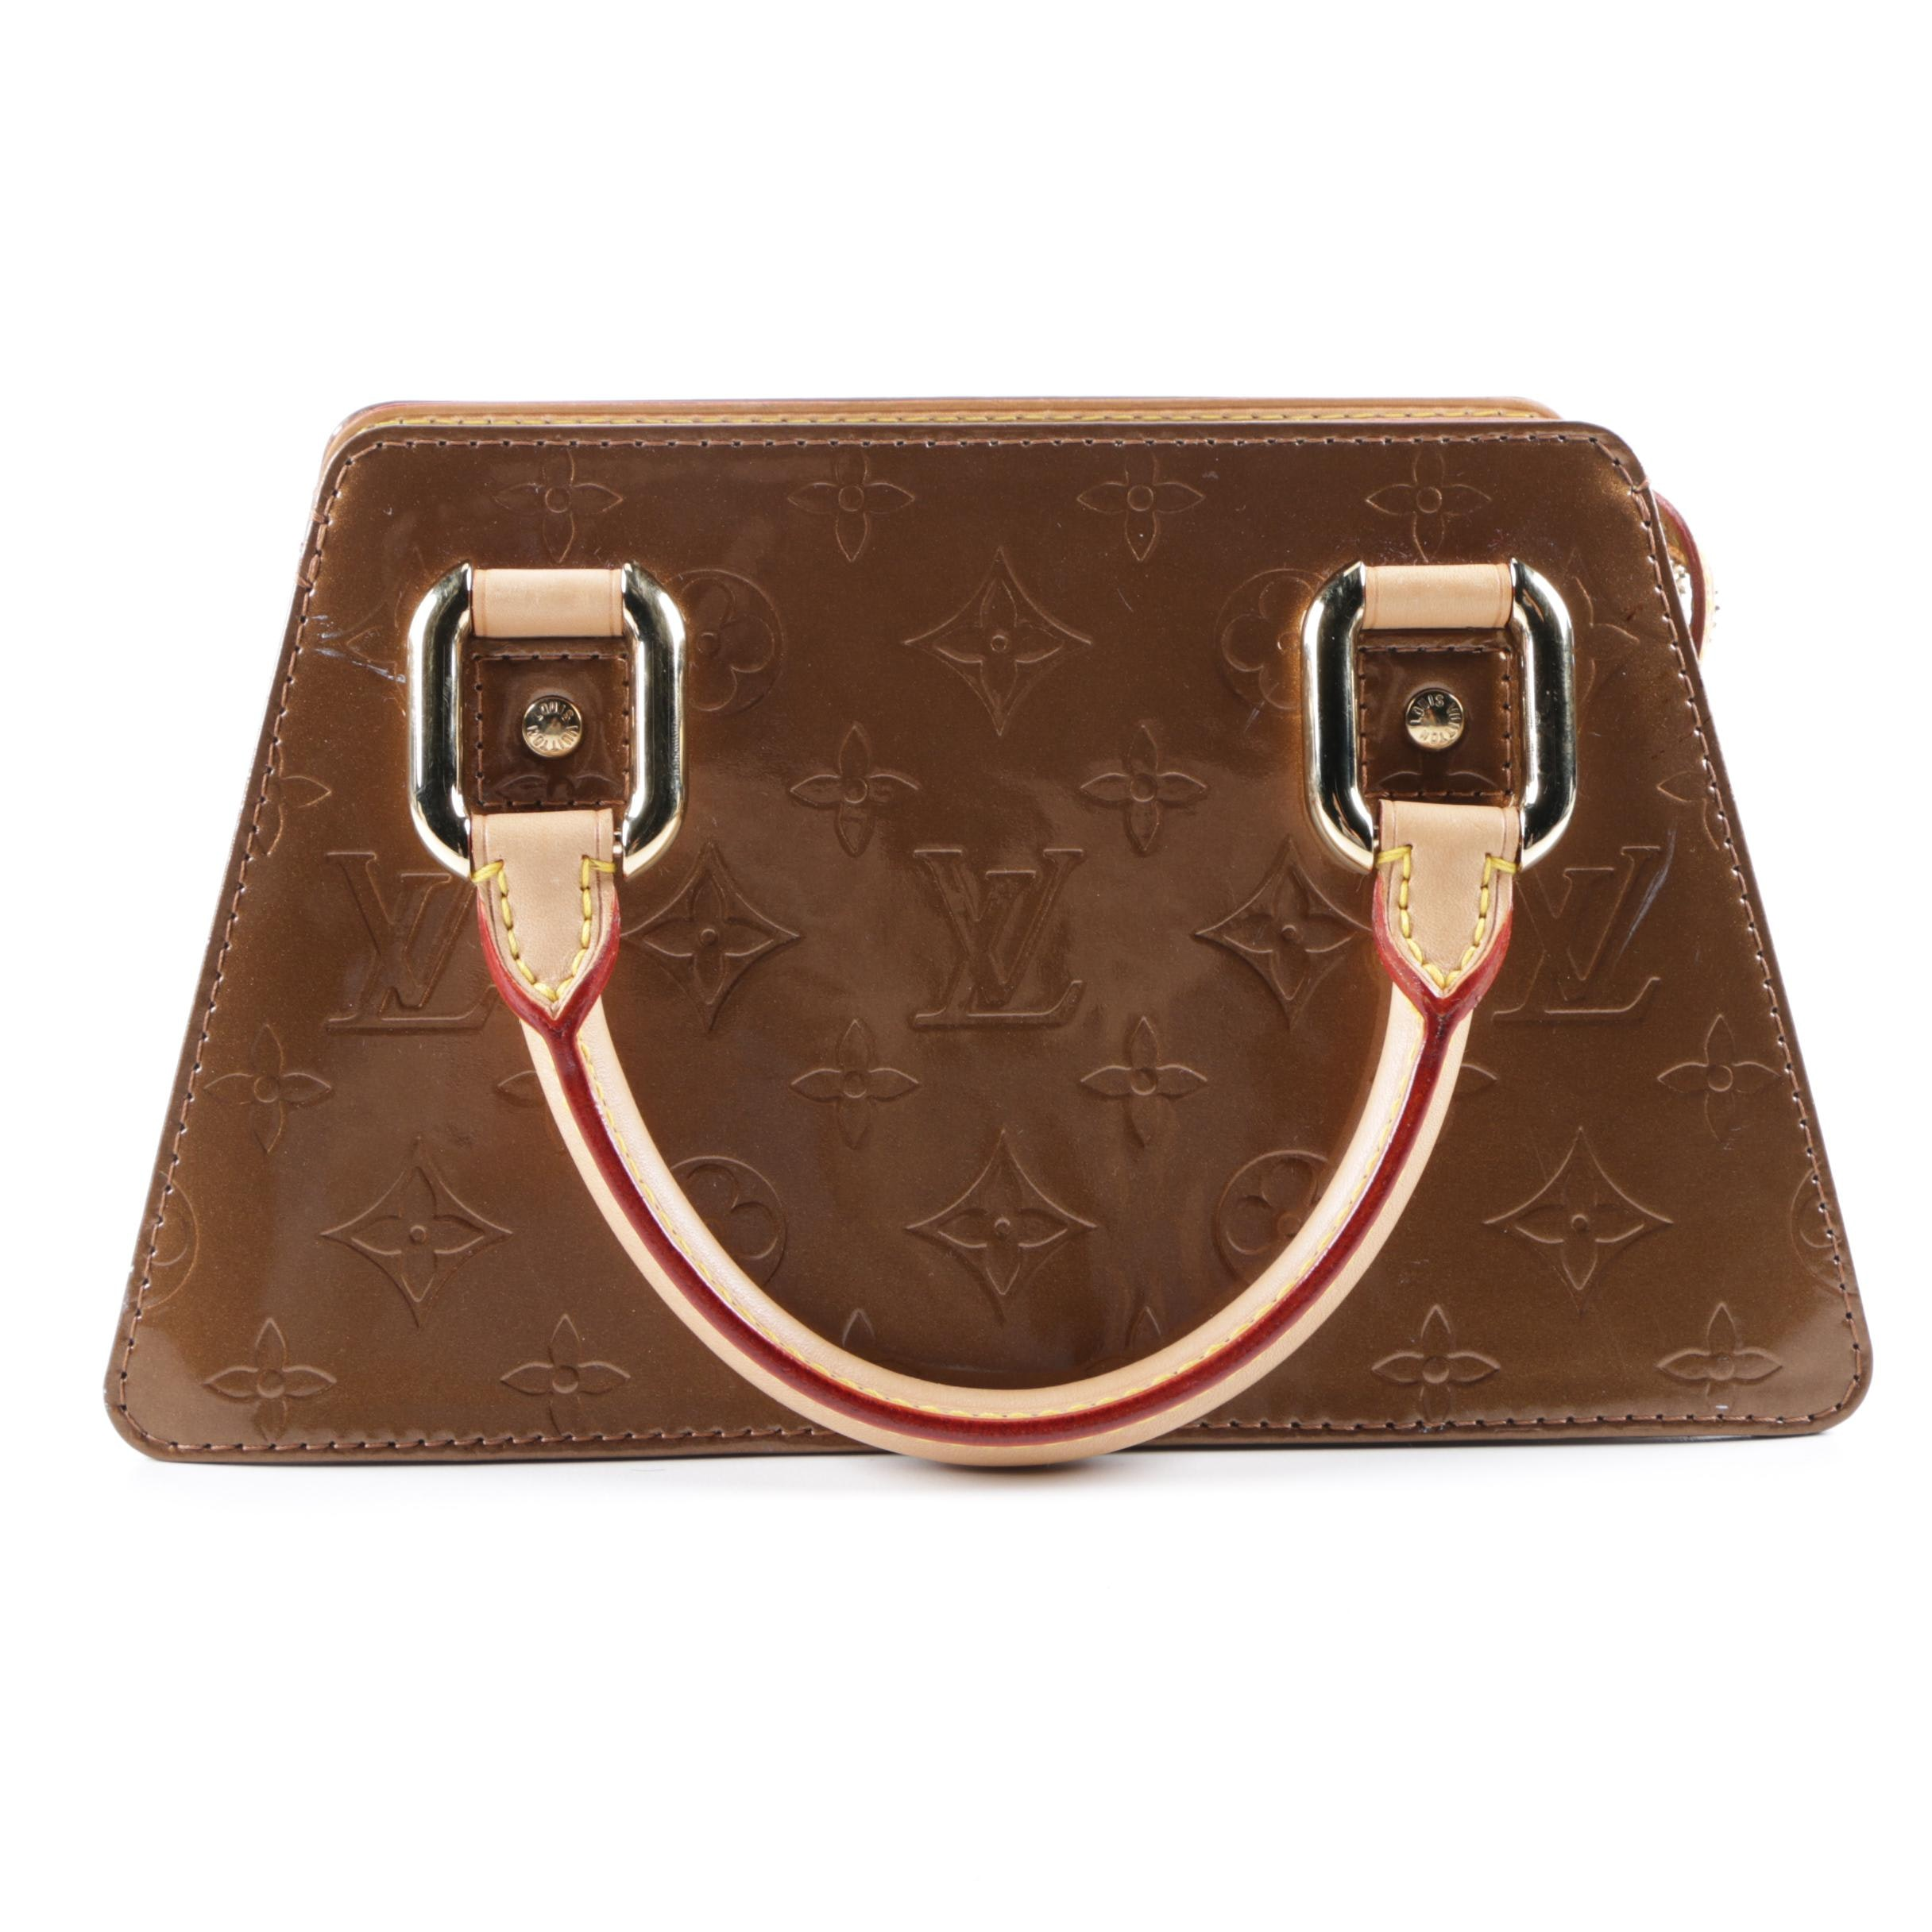 Louis Vuitton of Paris Forsyth Monogram Vernis Bronze Leather Handbag